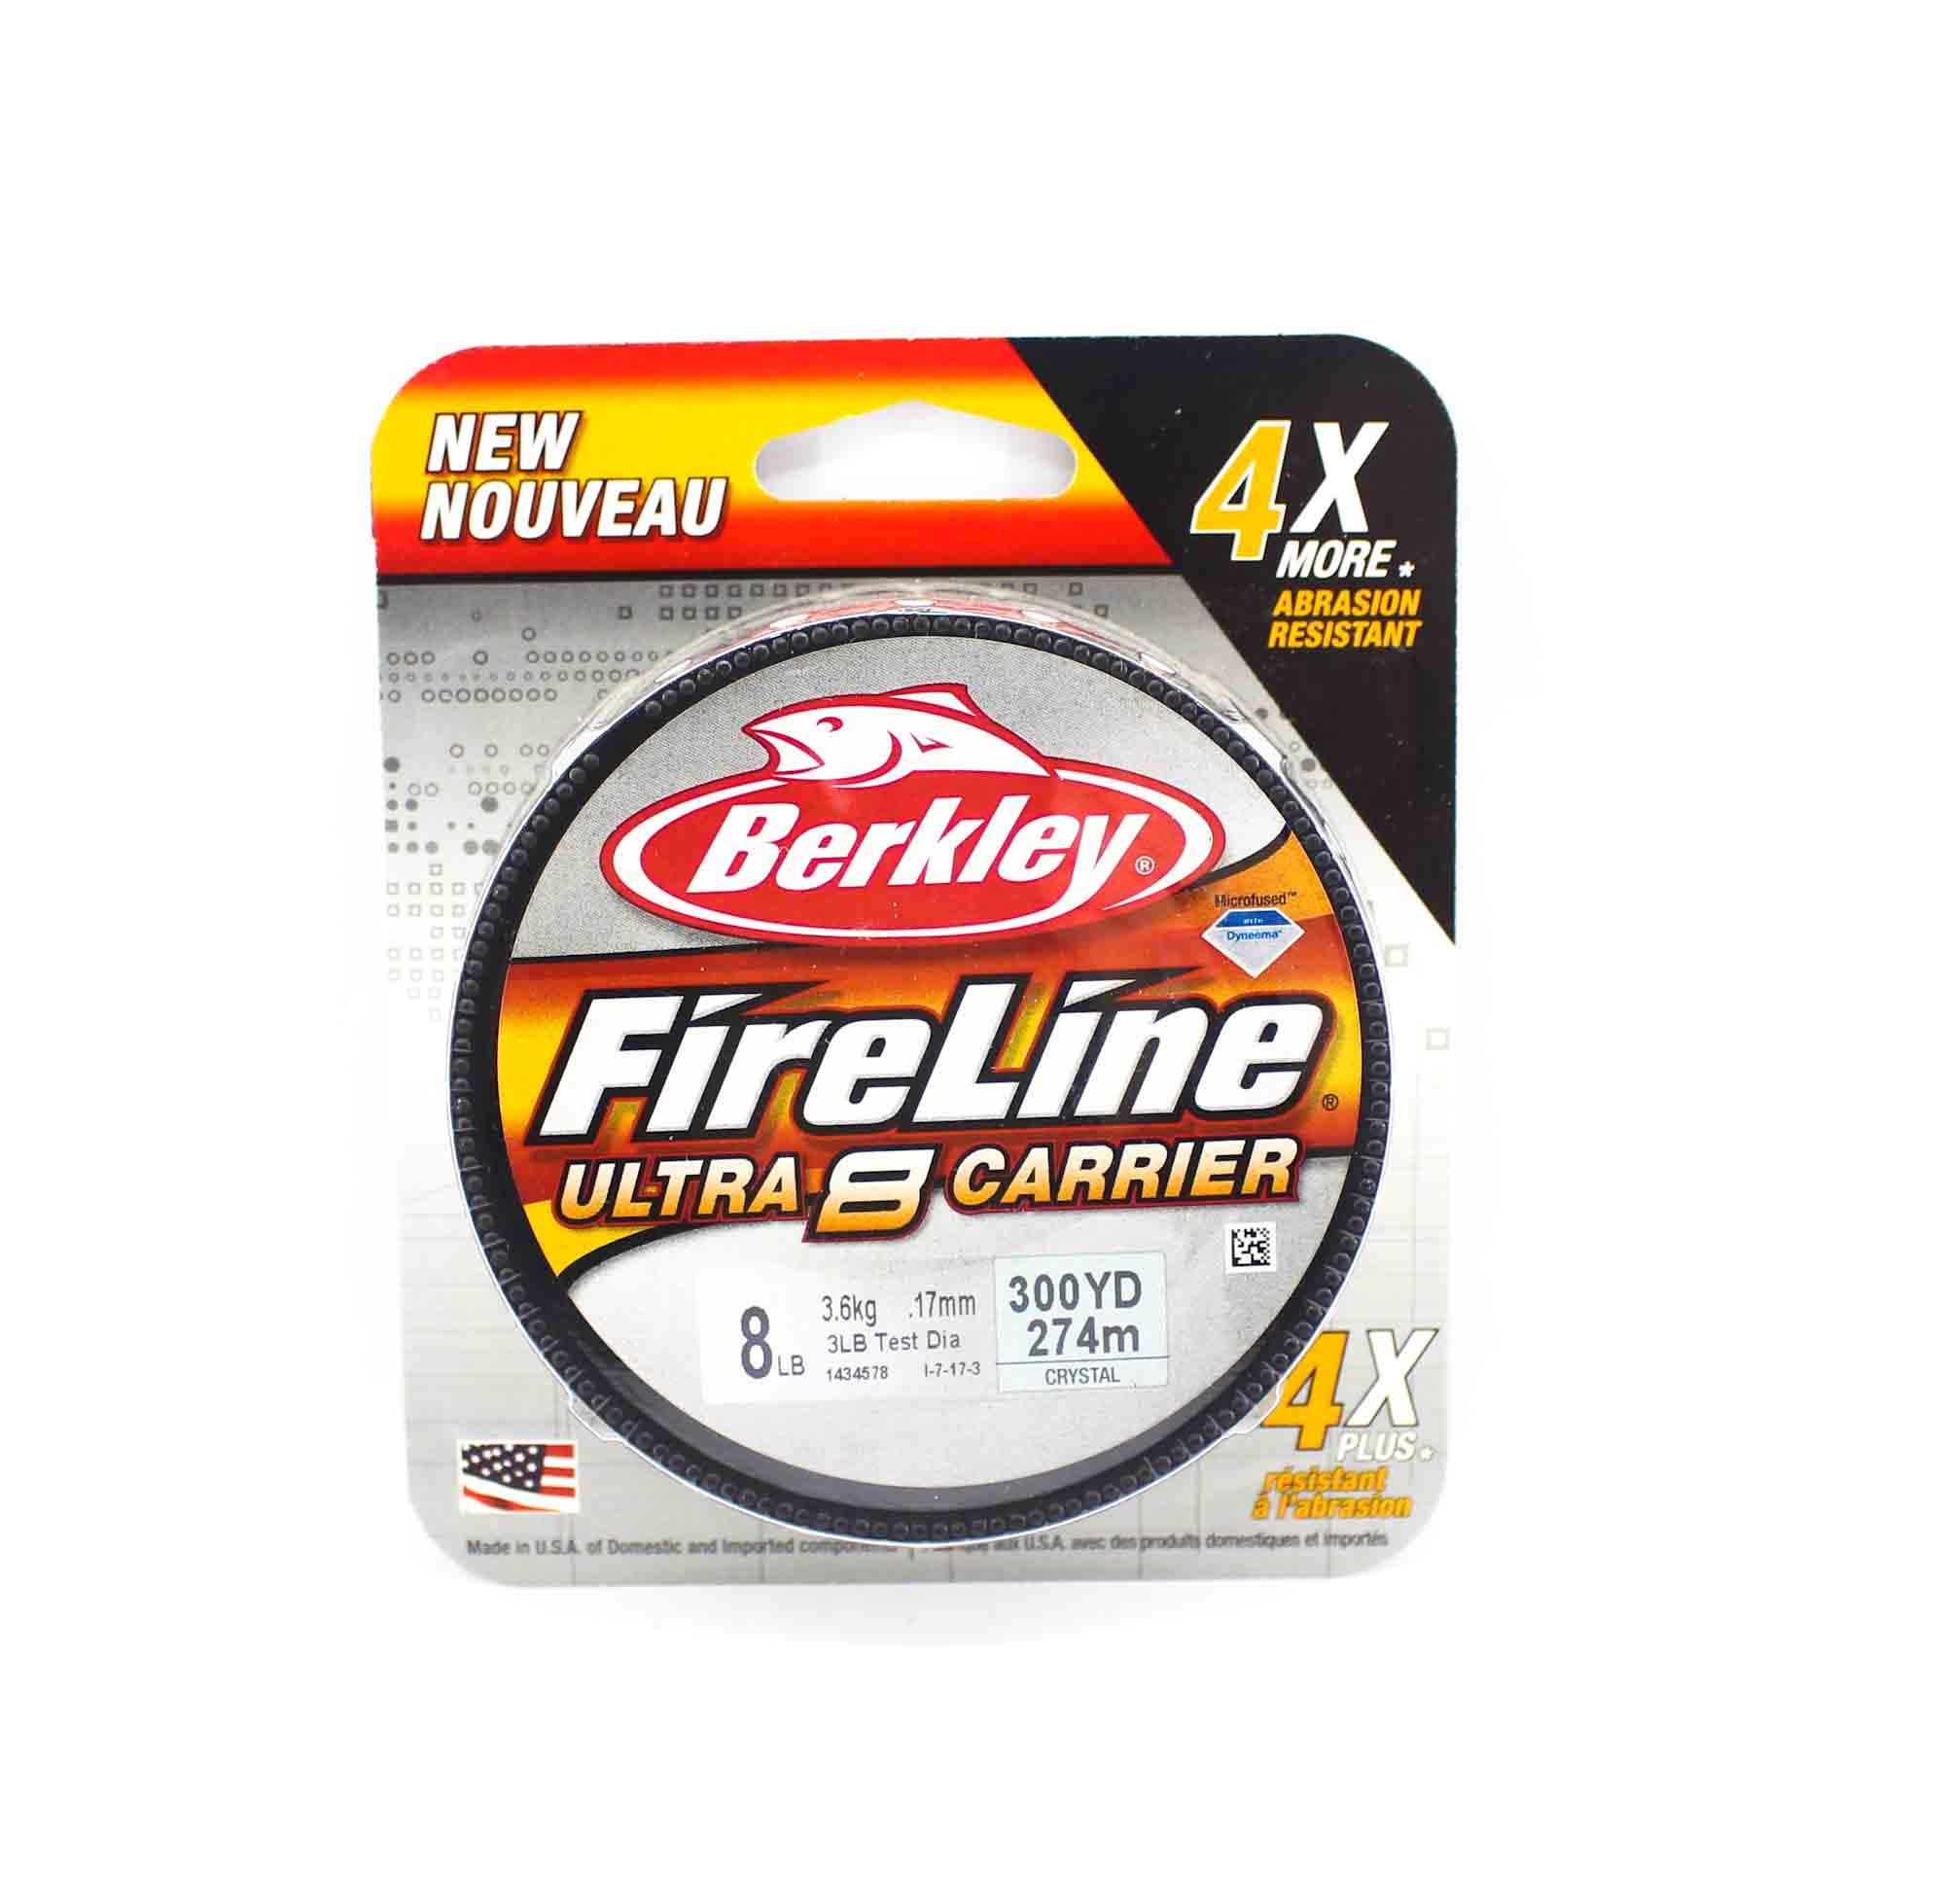 Berkley Fireline Ultra 8 Carrier 300yds 8lb White (4540)